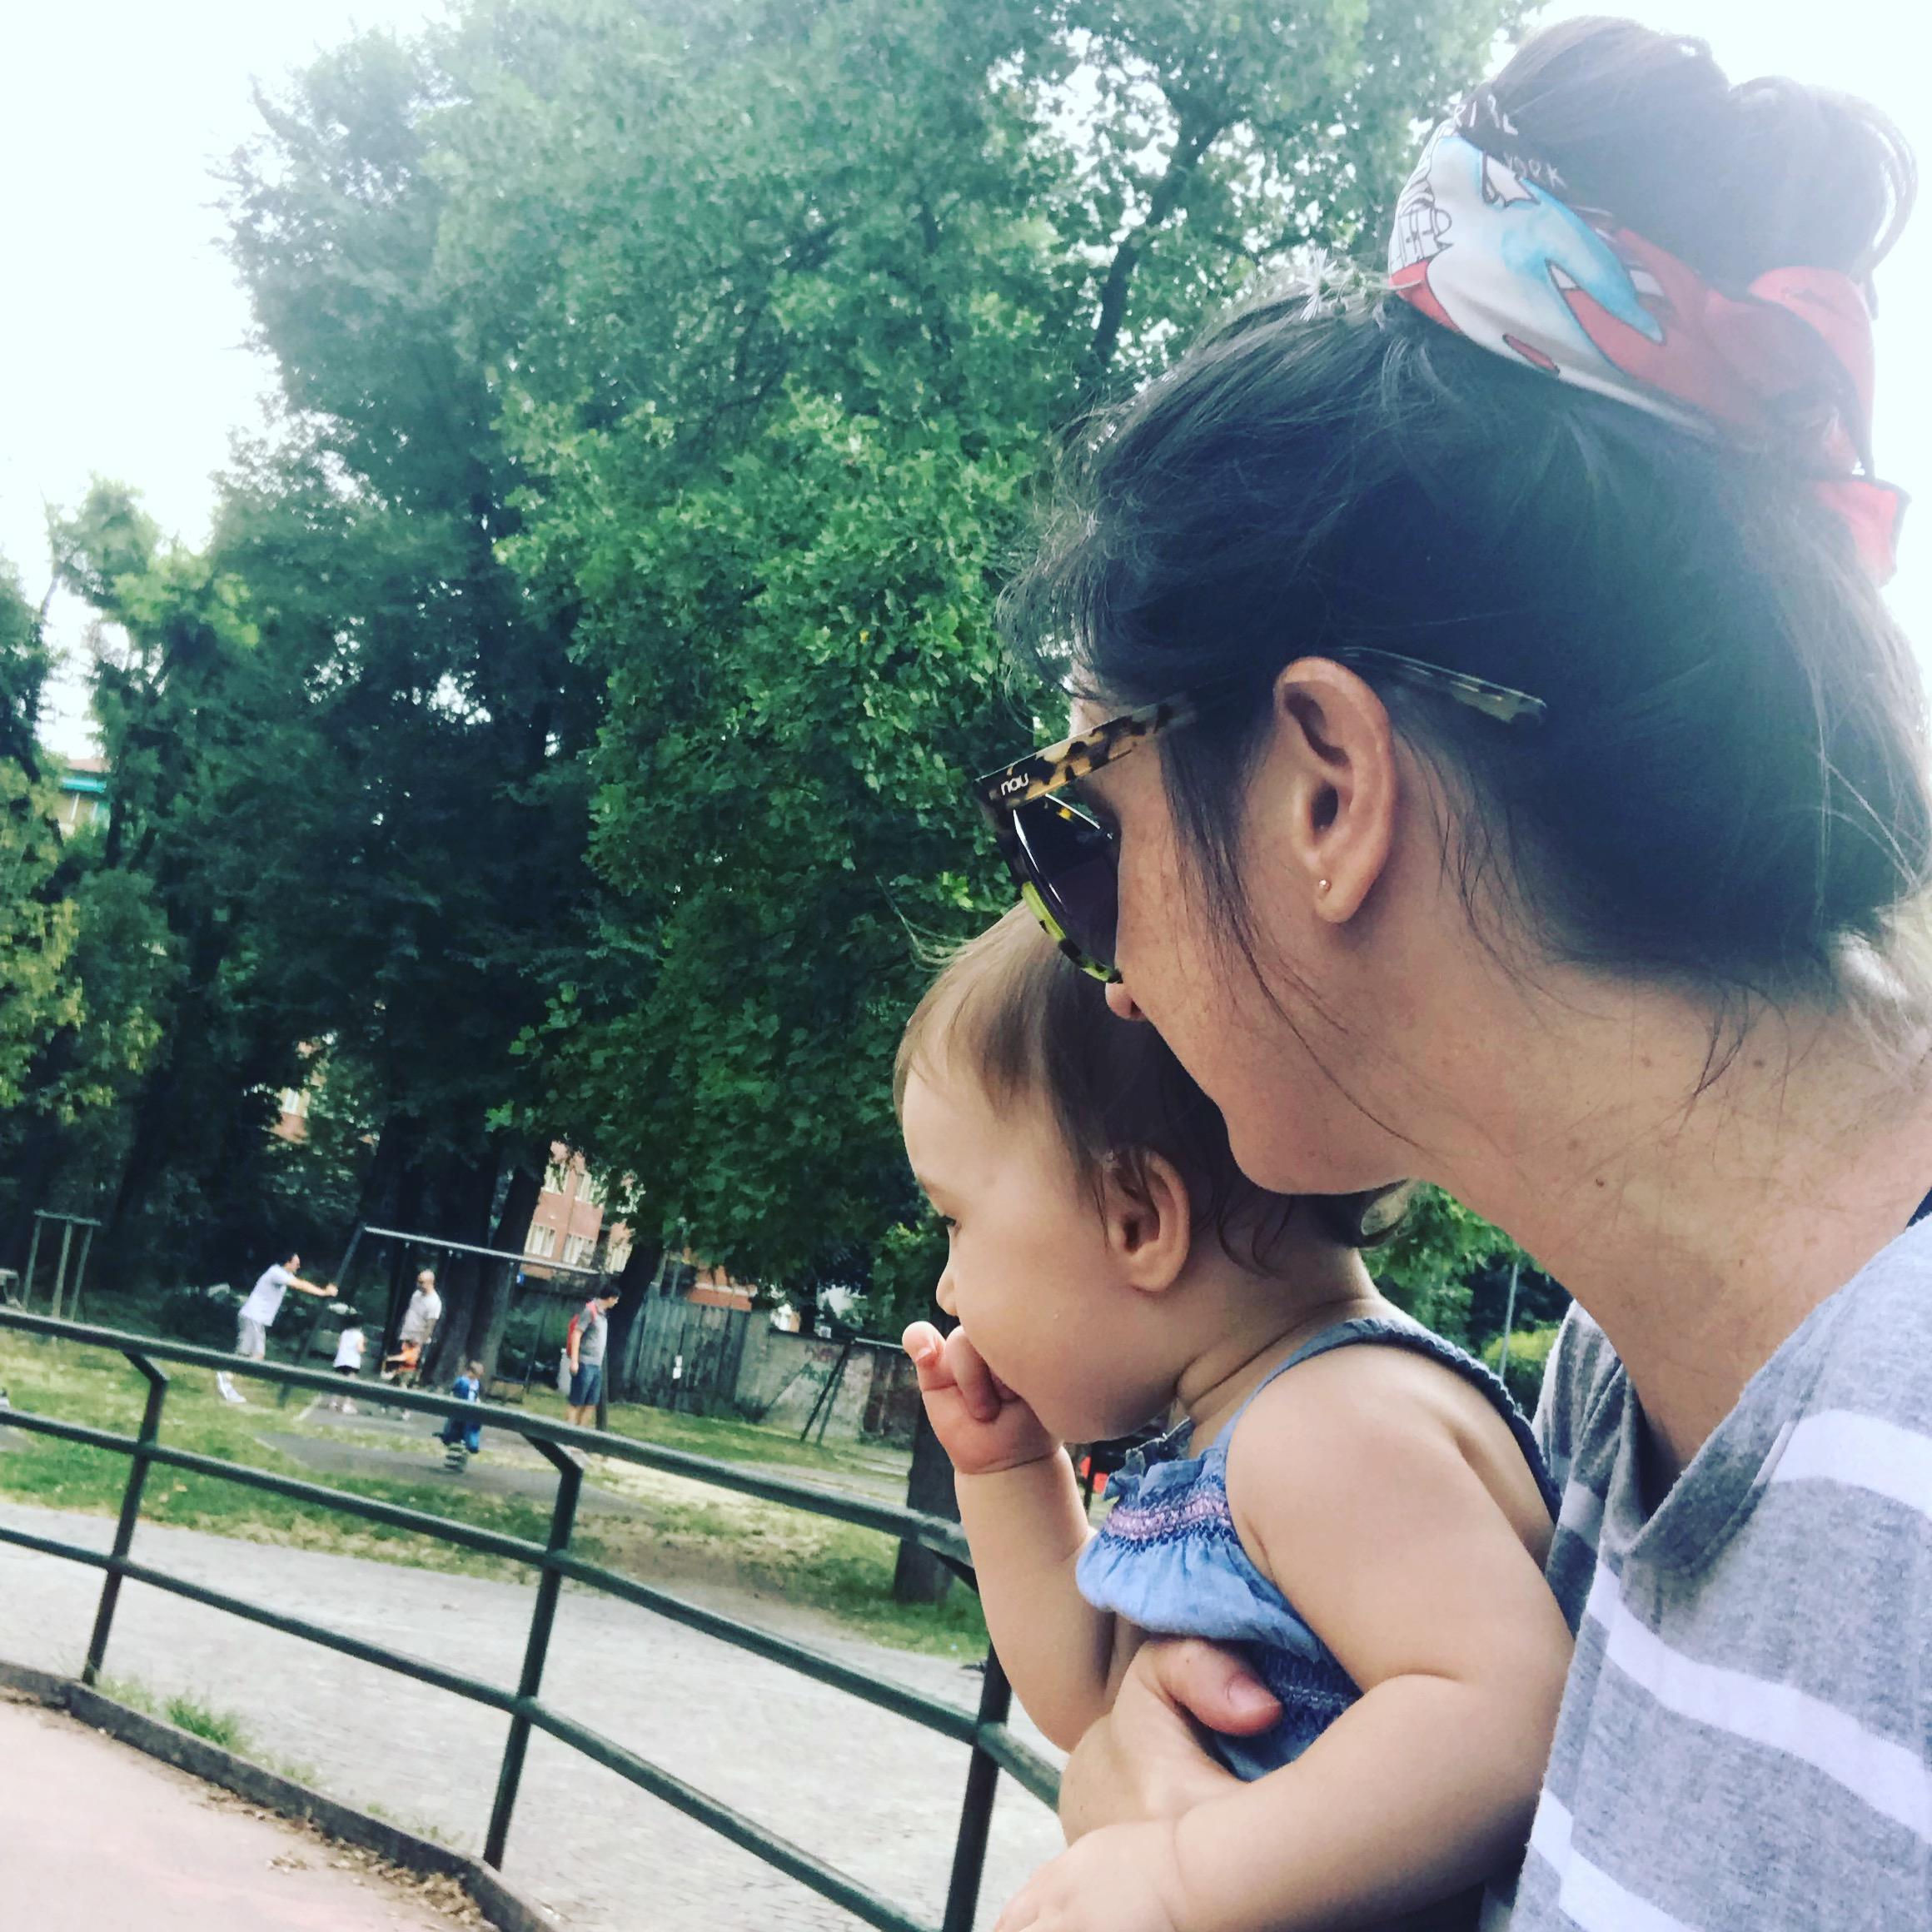 Motherhood Around The Globe - Motherhood Around the Globe: Sobre Criar Filhos na Itália, por Mariana Marchioni